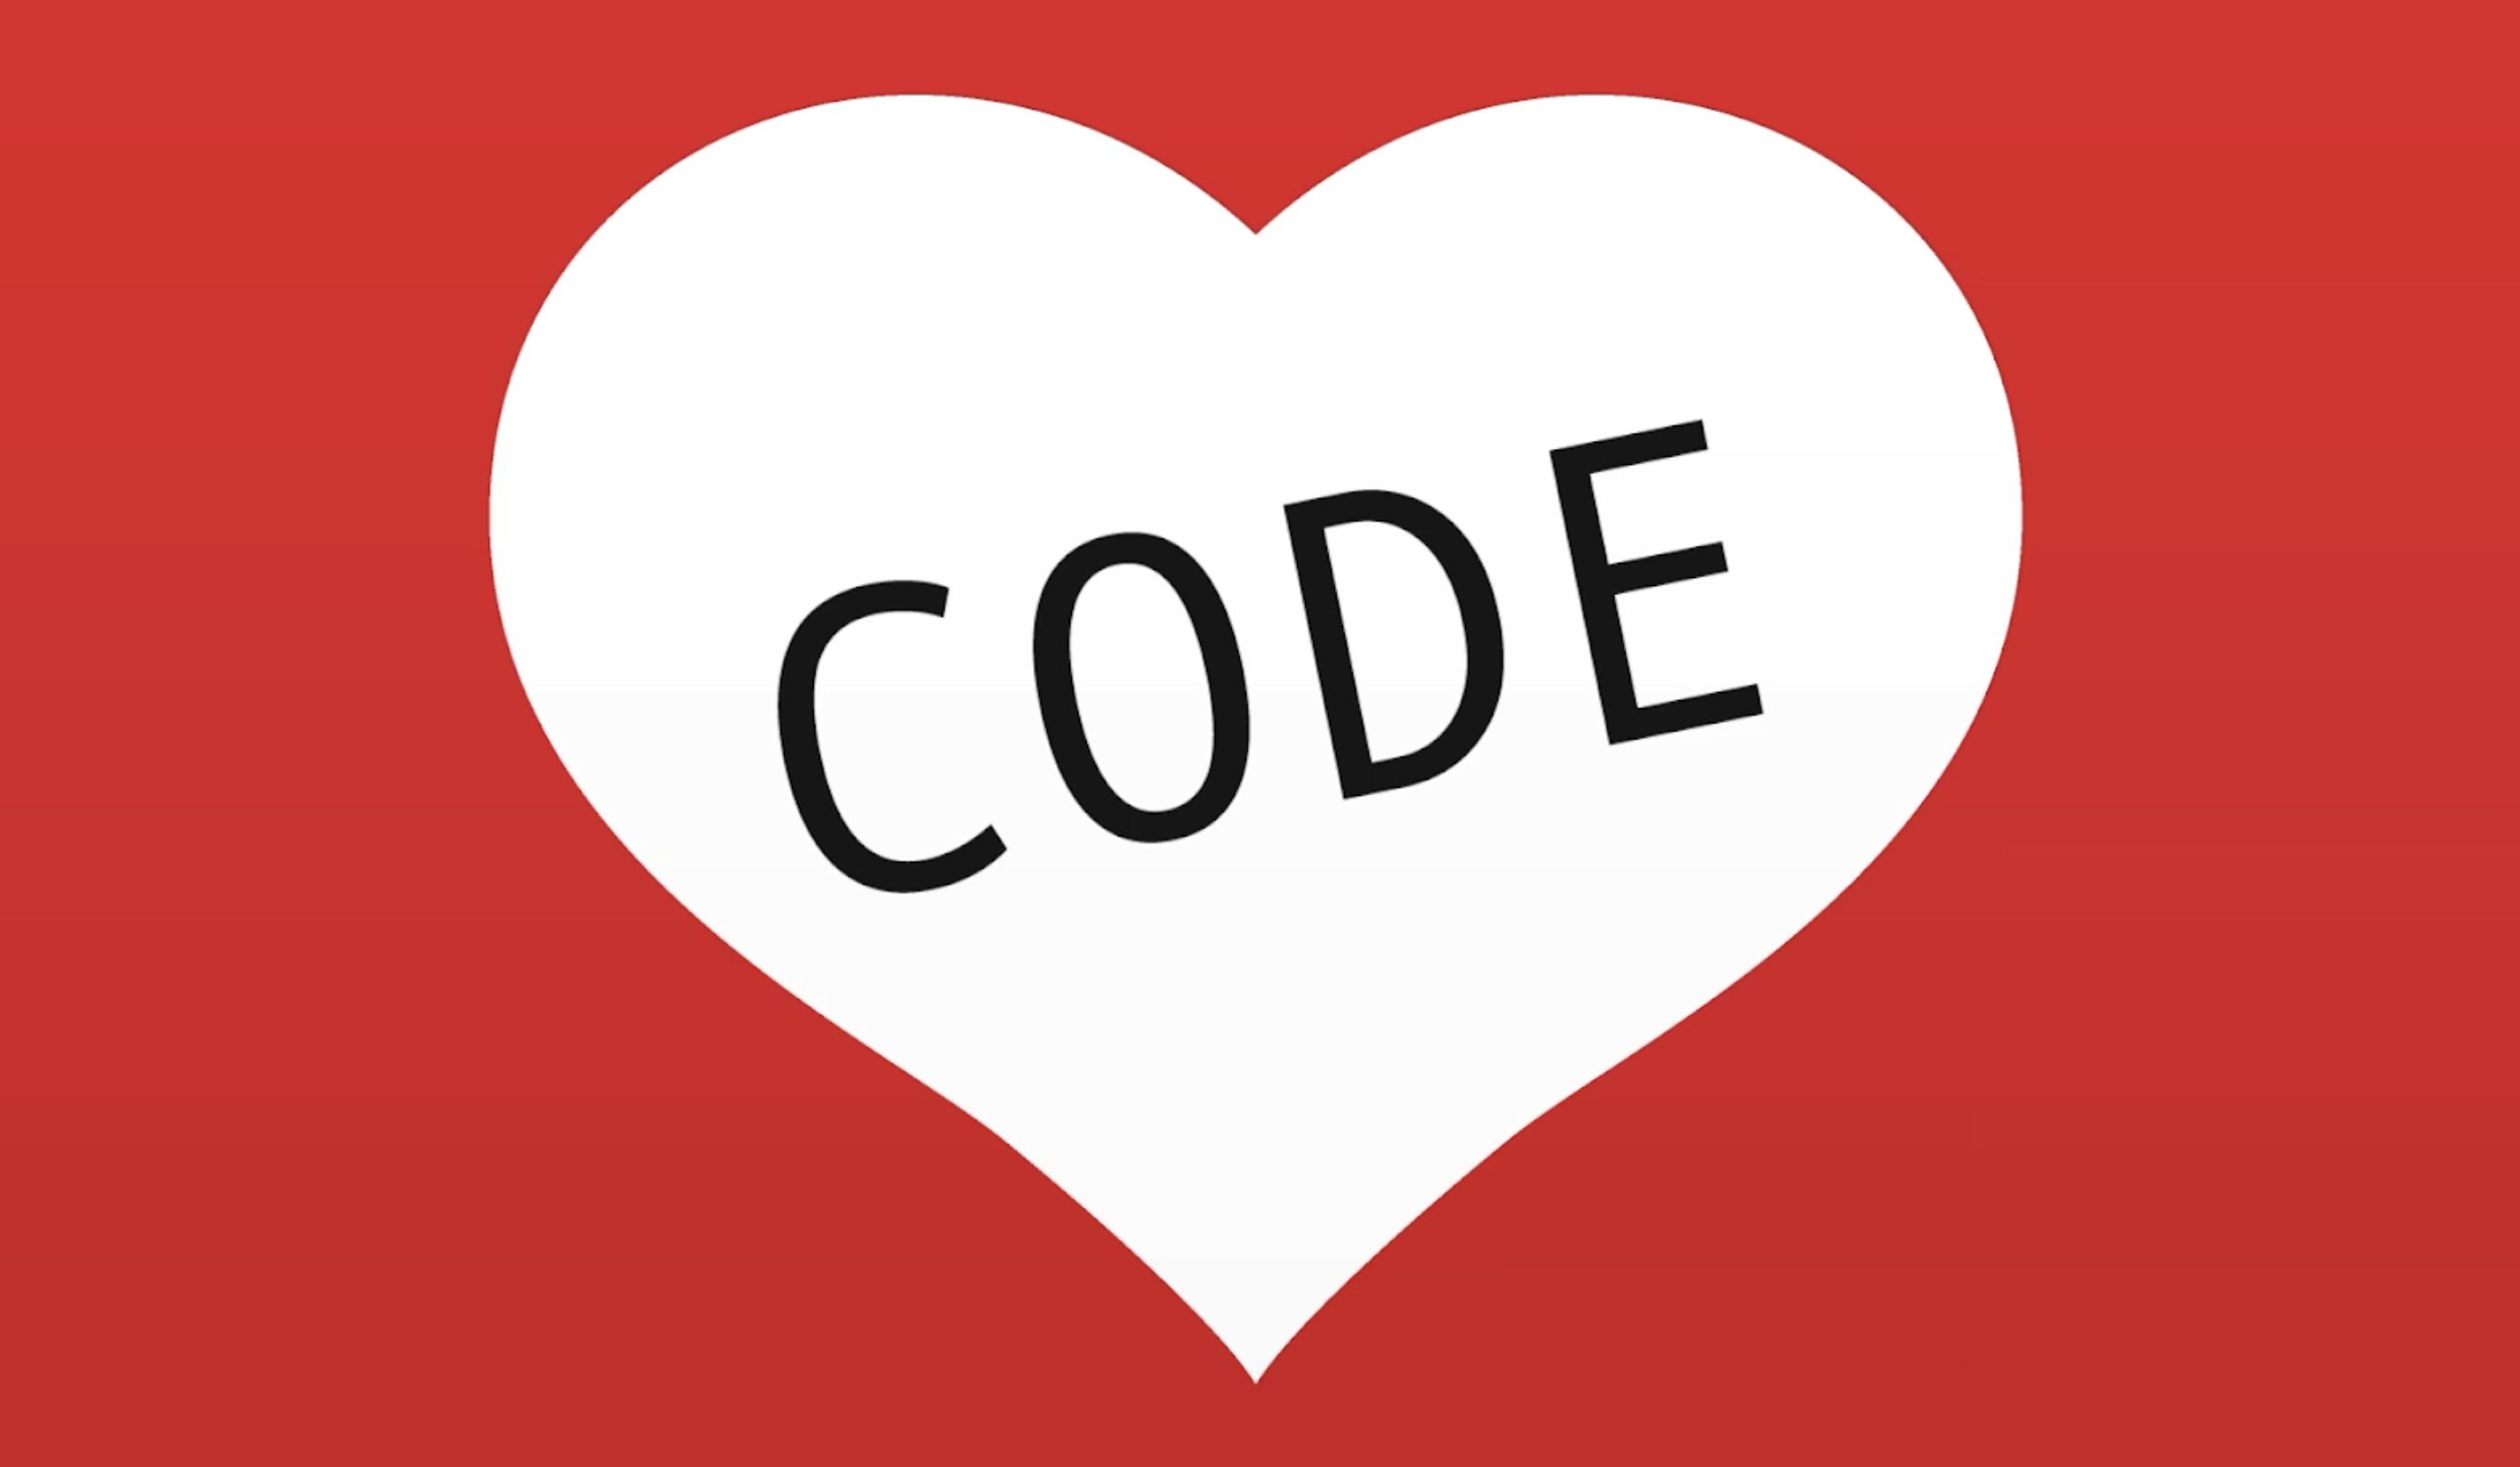 I Heart Code